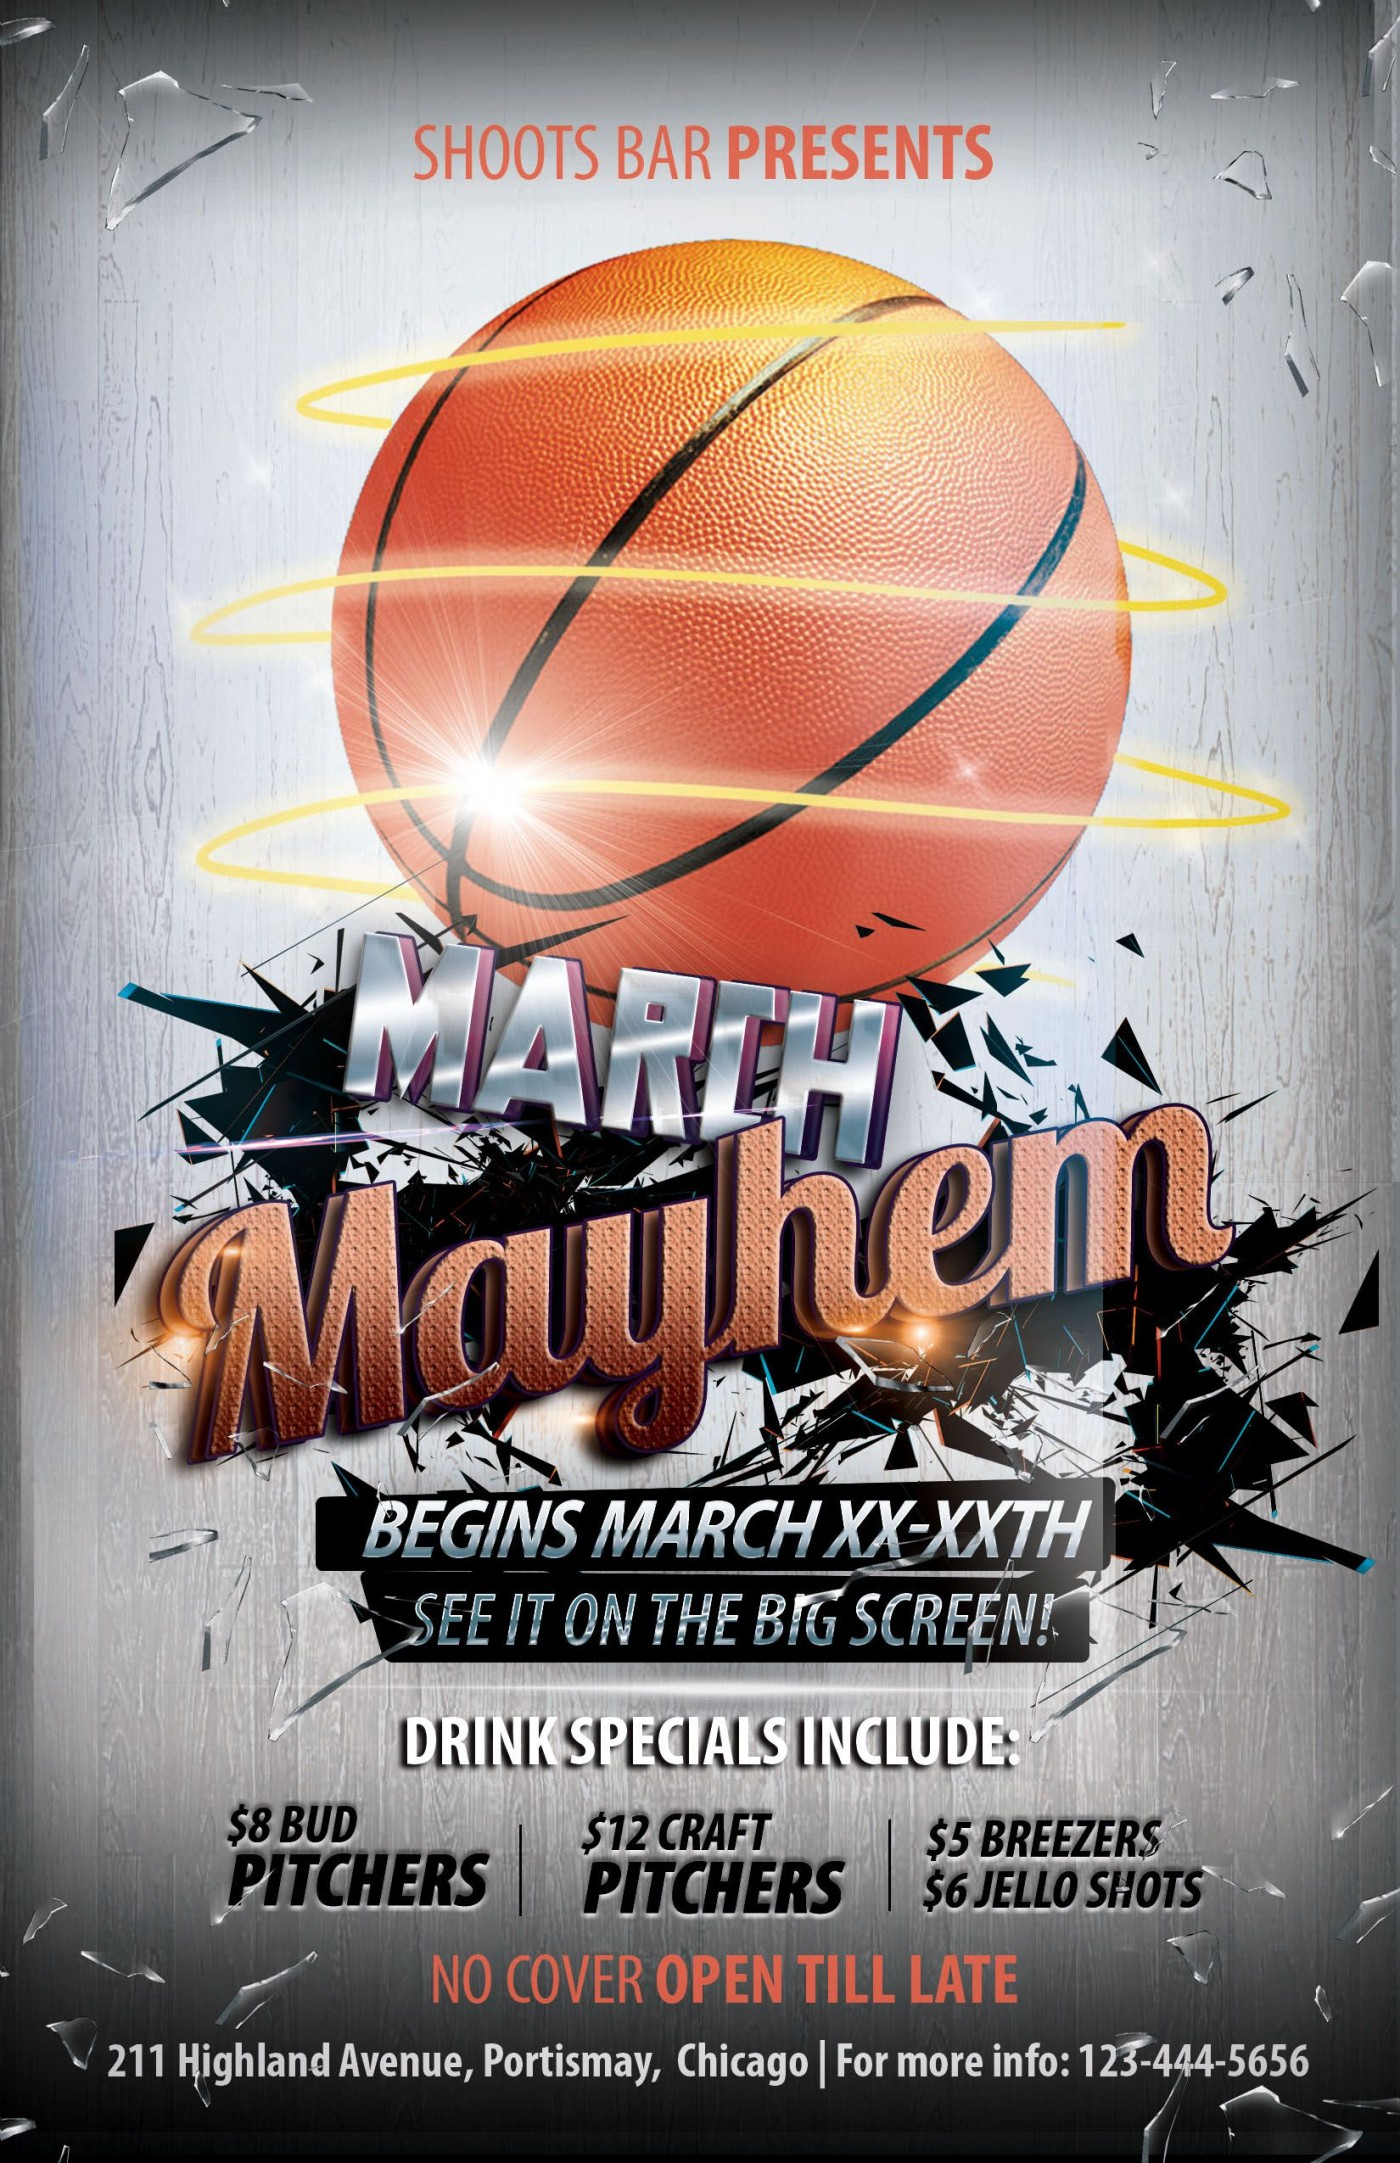 003 Rare Basketball Tournament Flyer Template Design  3 On Free1400